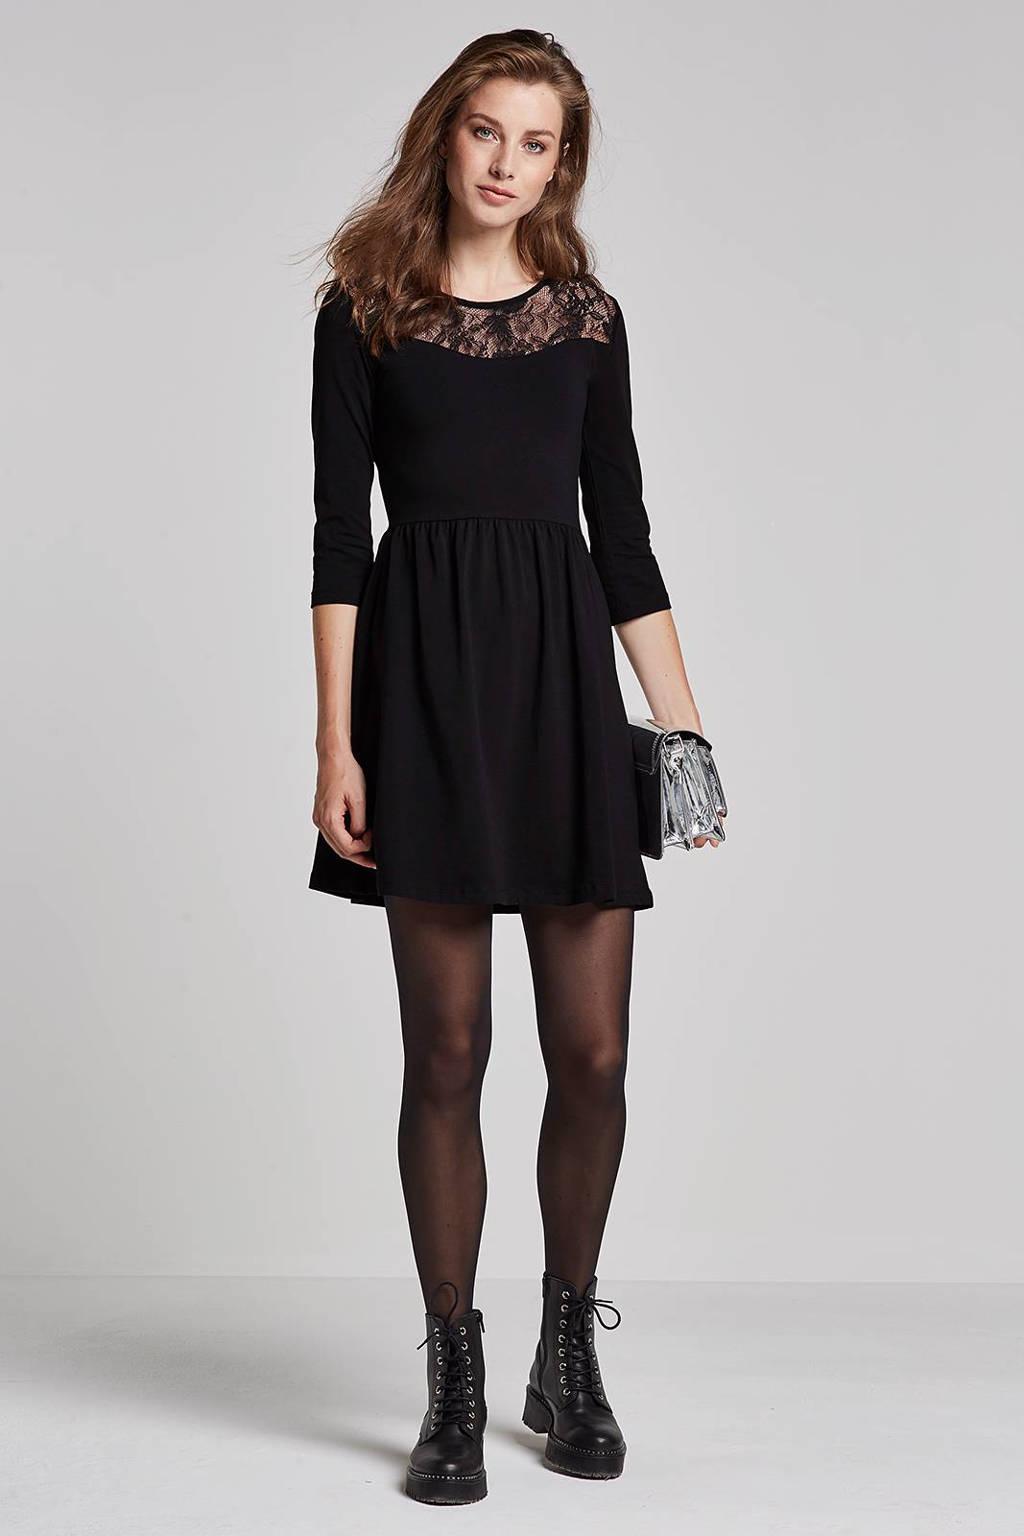 ONLY jurk met kant, Zwart